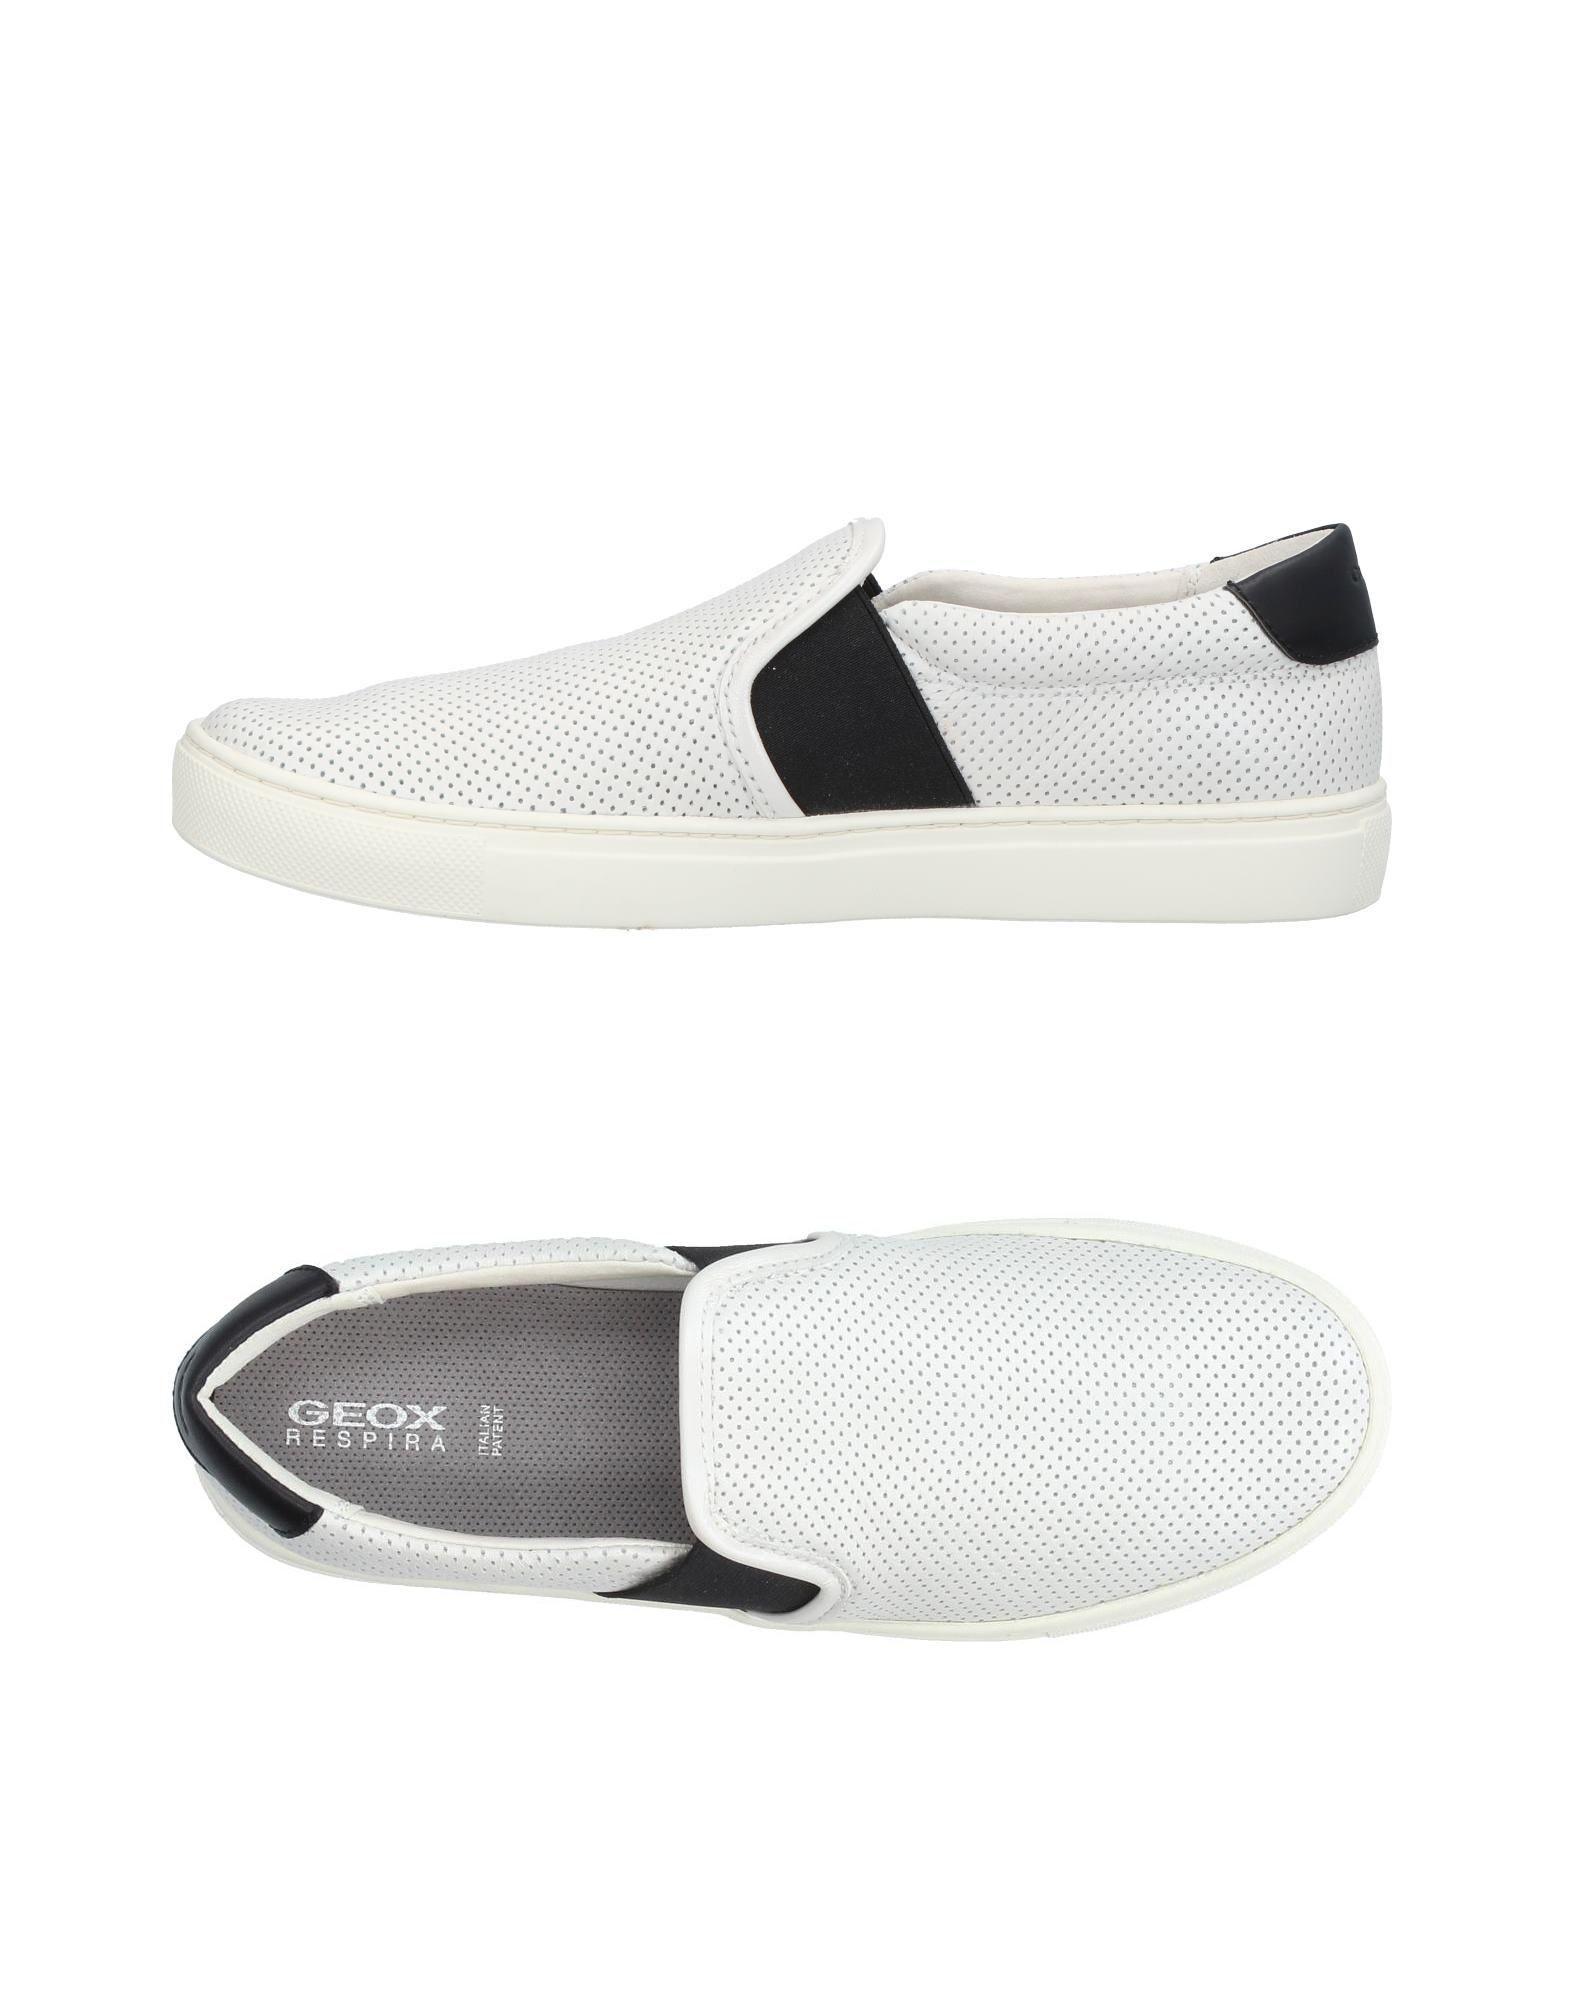 Geox Sneakers Sneakers Geox Damen  11392596WI  5abf2c